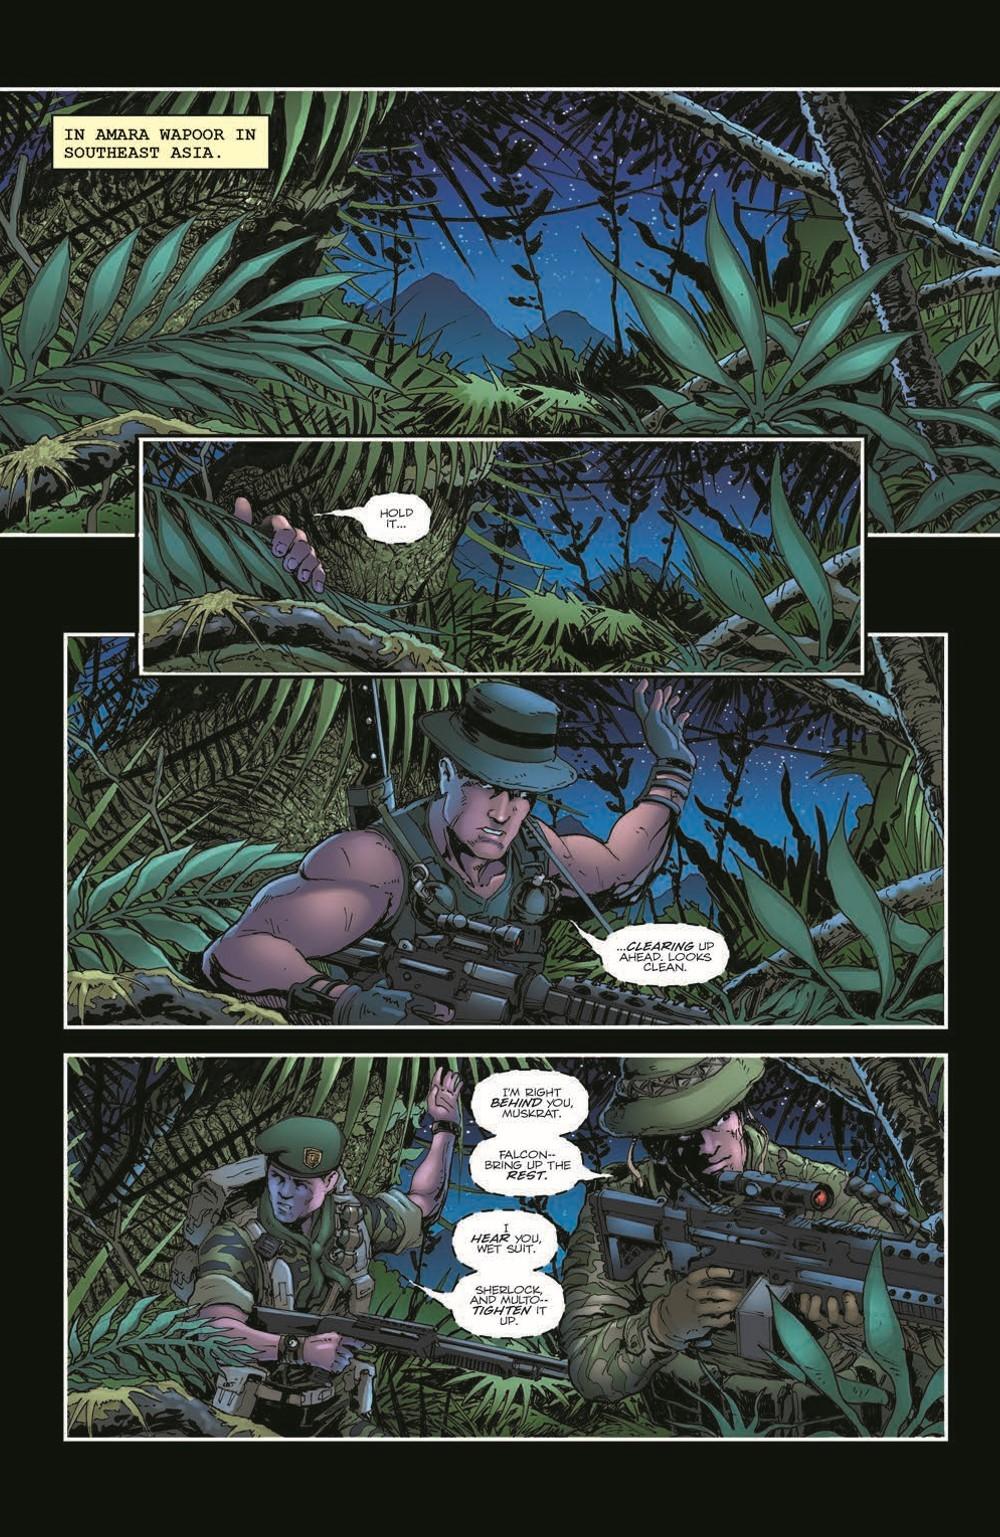 GIJoeRAH285-pr-3 ComicList Previews: G.I. JOE A REAL AMERICAN HERO #285